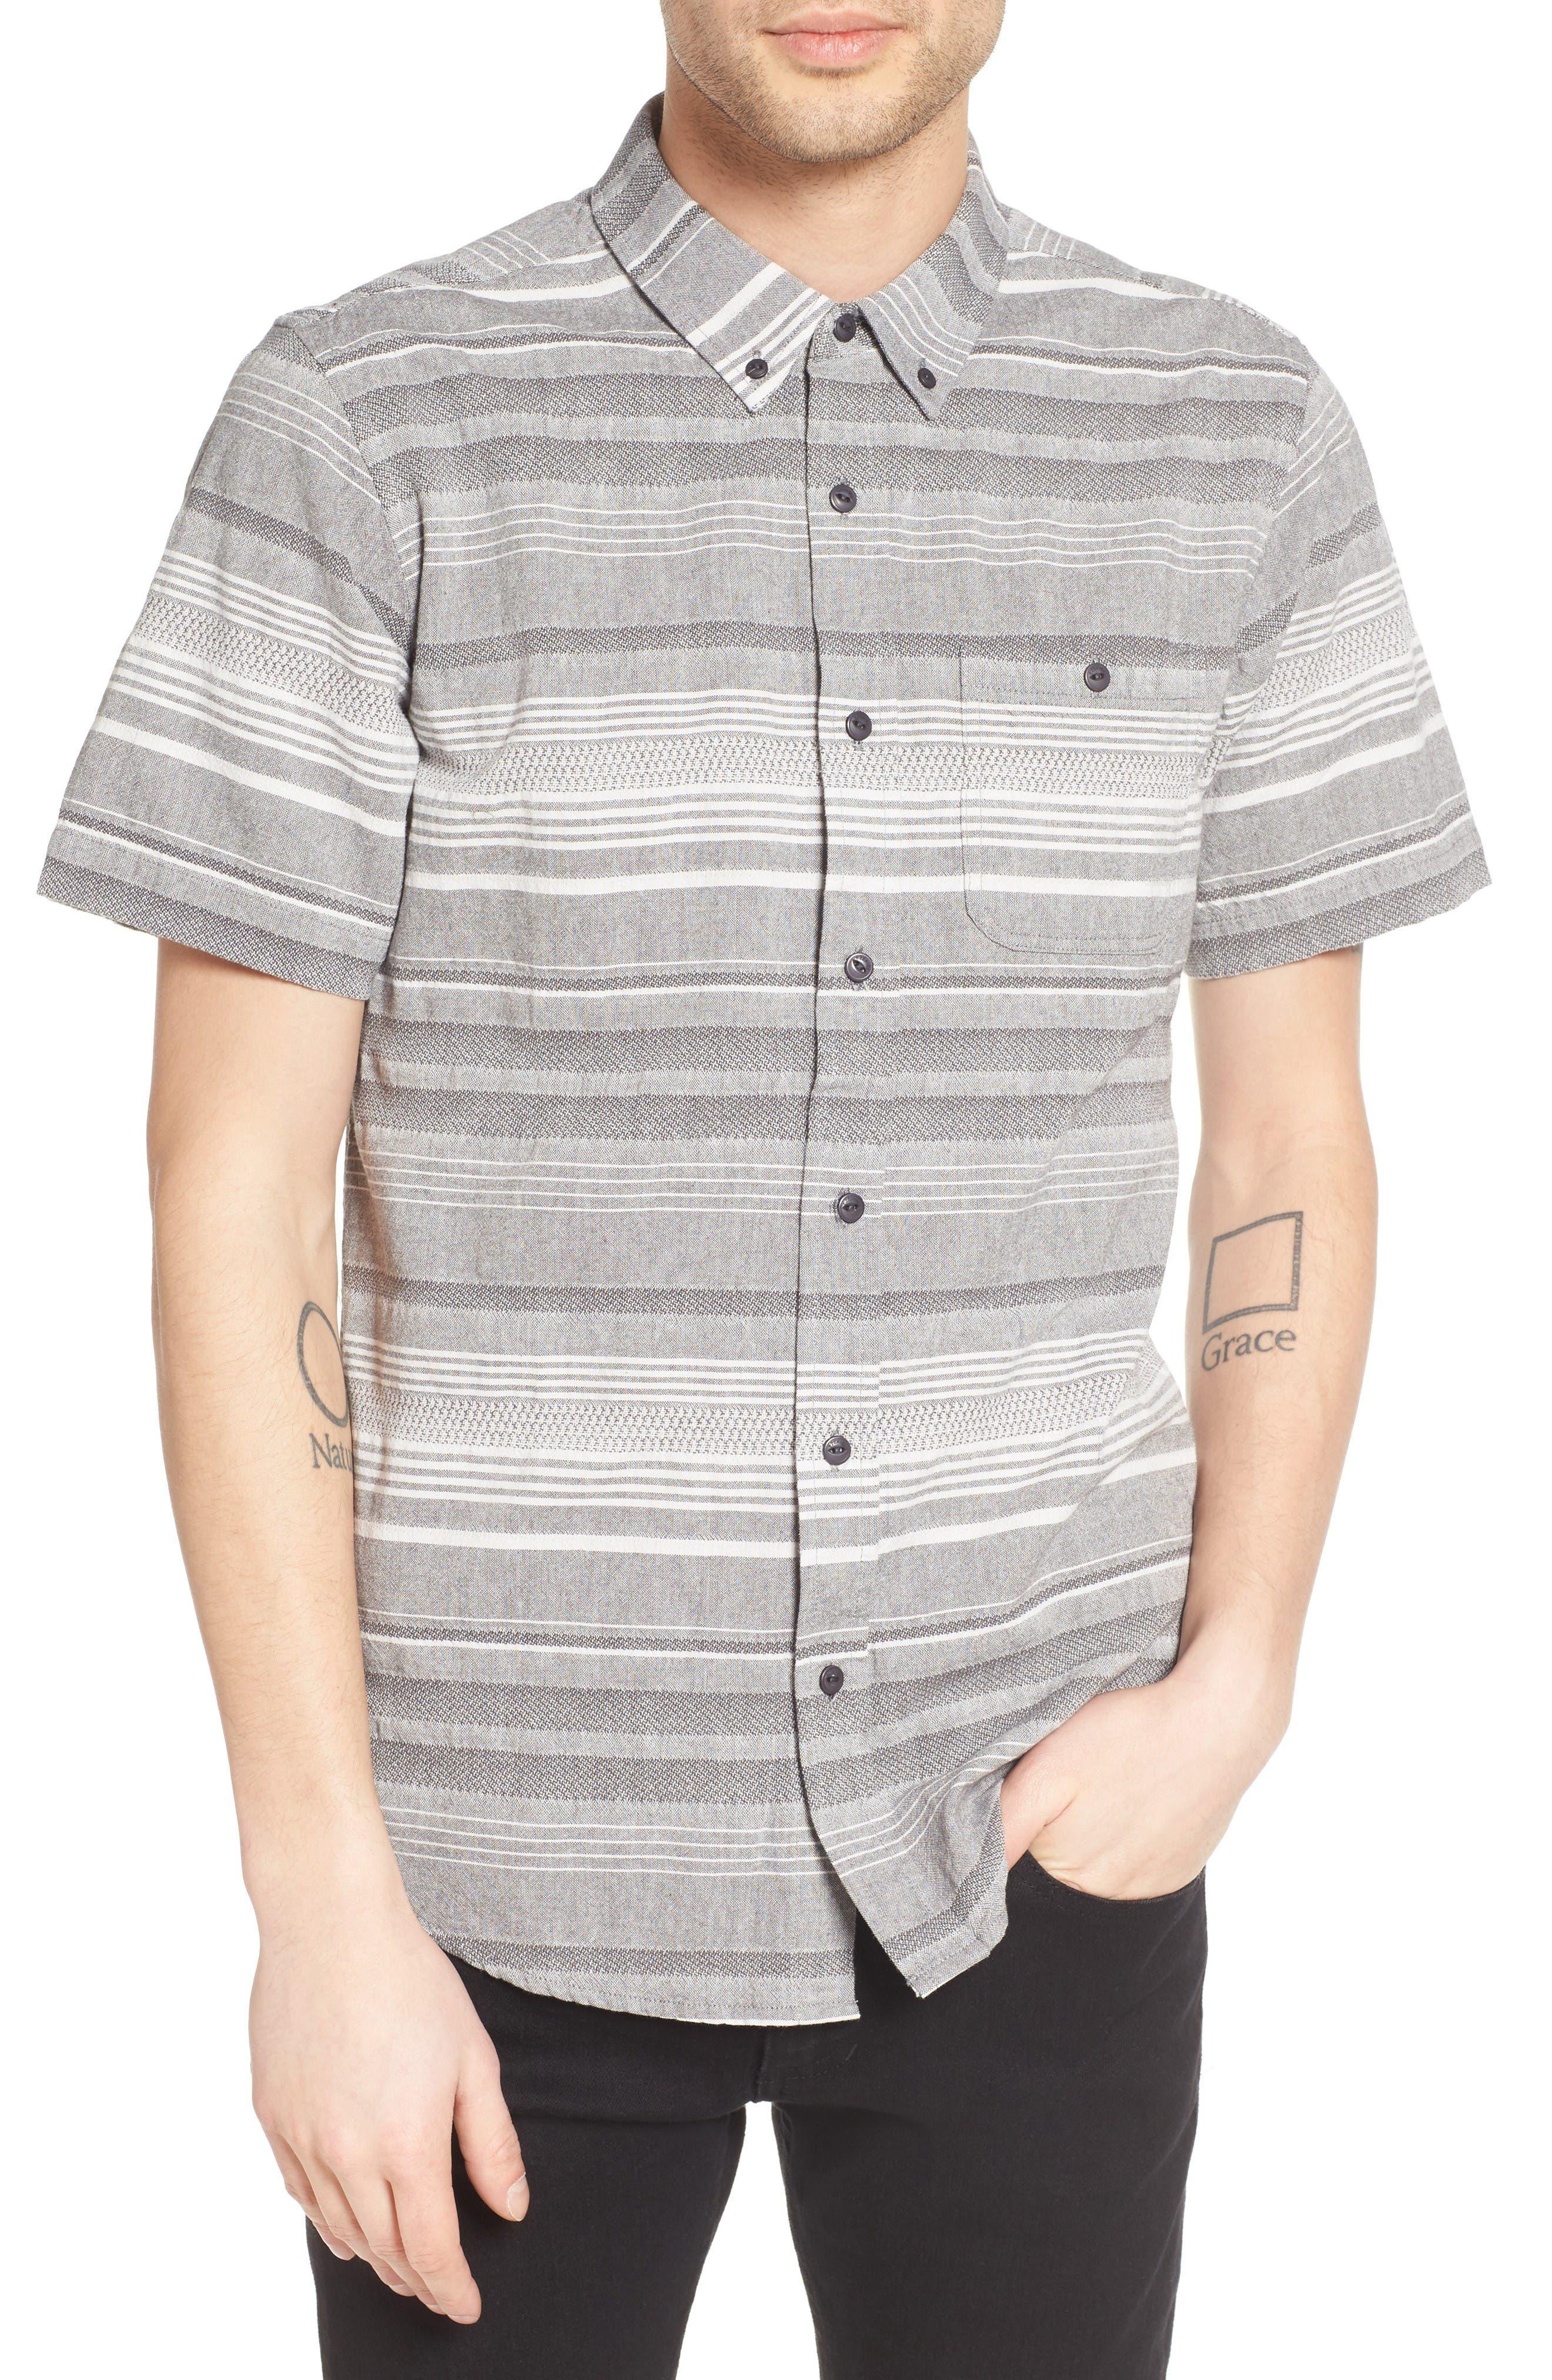 Alternate Image 1 Selected - Ezekiel Striped Woven Shirt